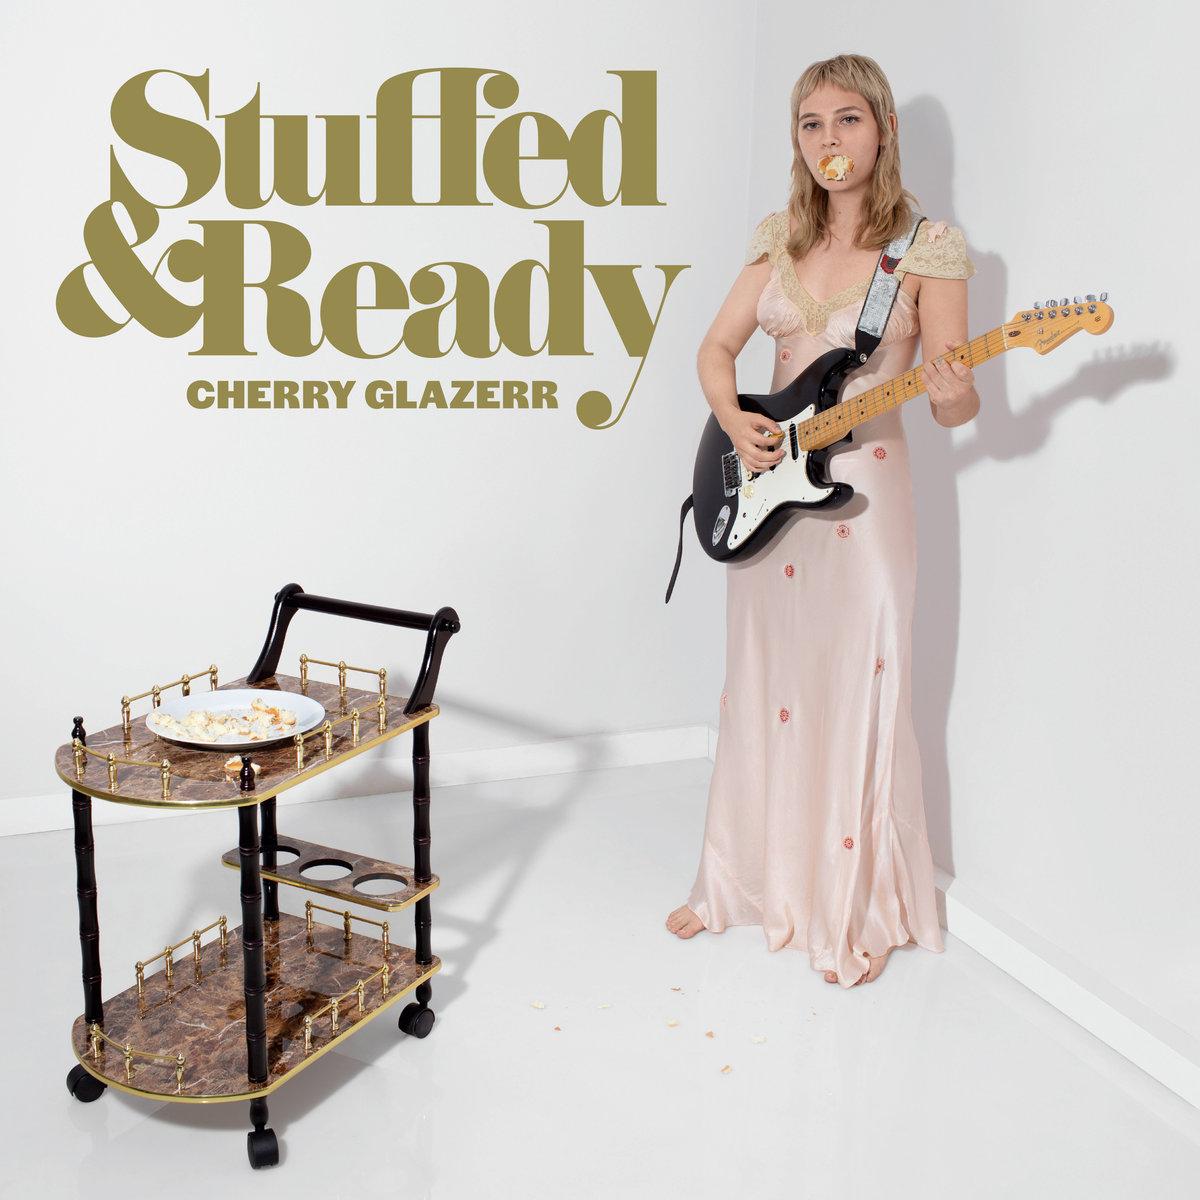 Cherry Glazerr - Stuffed & Ready LP